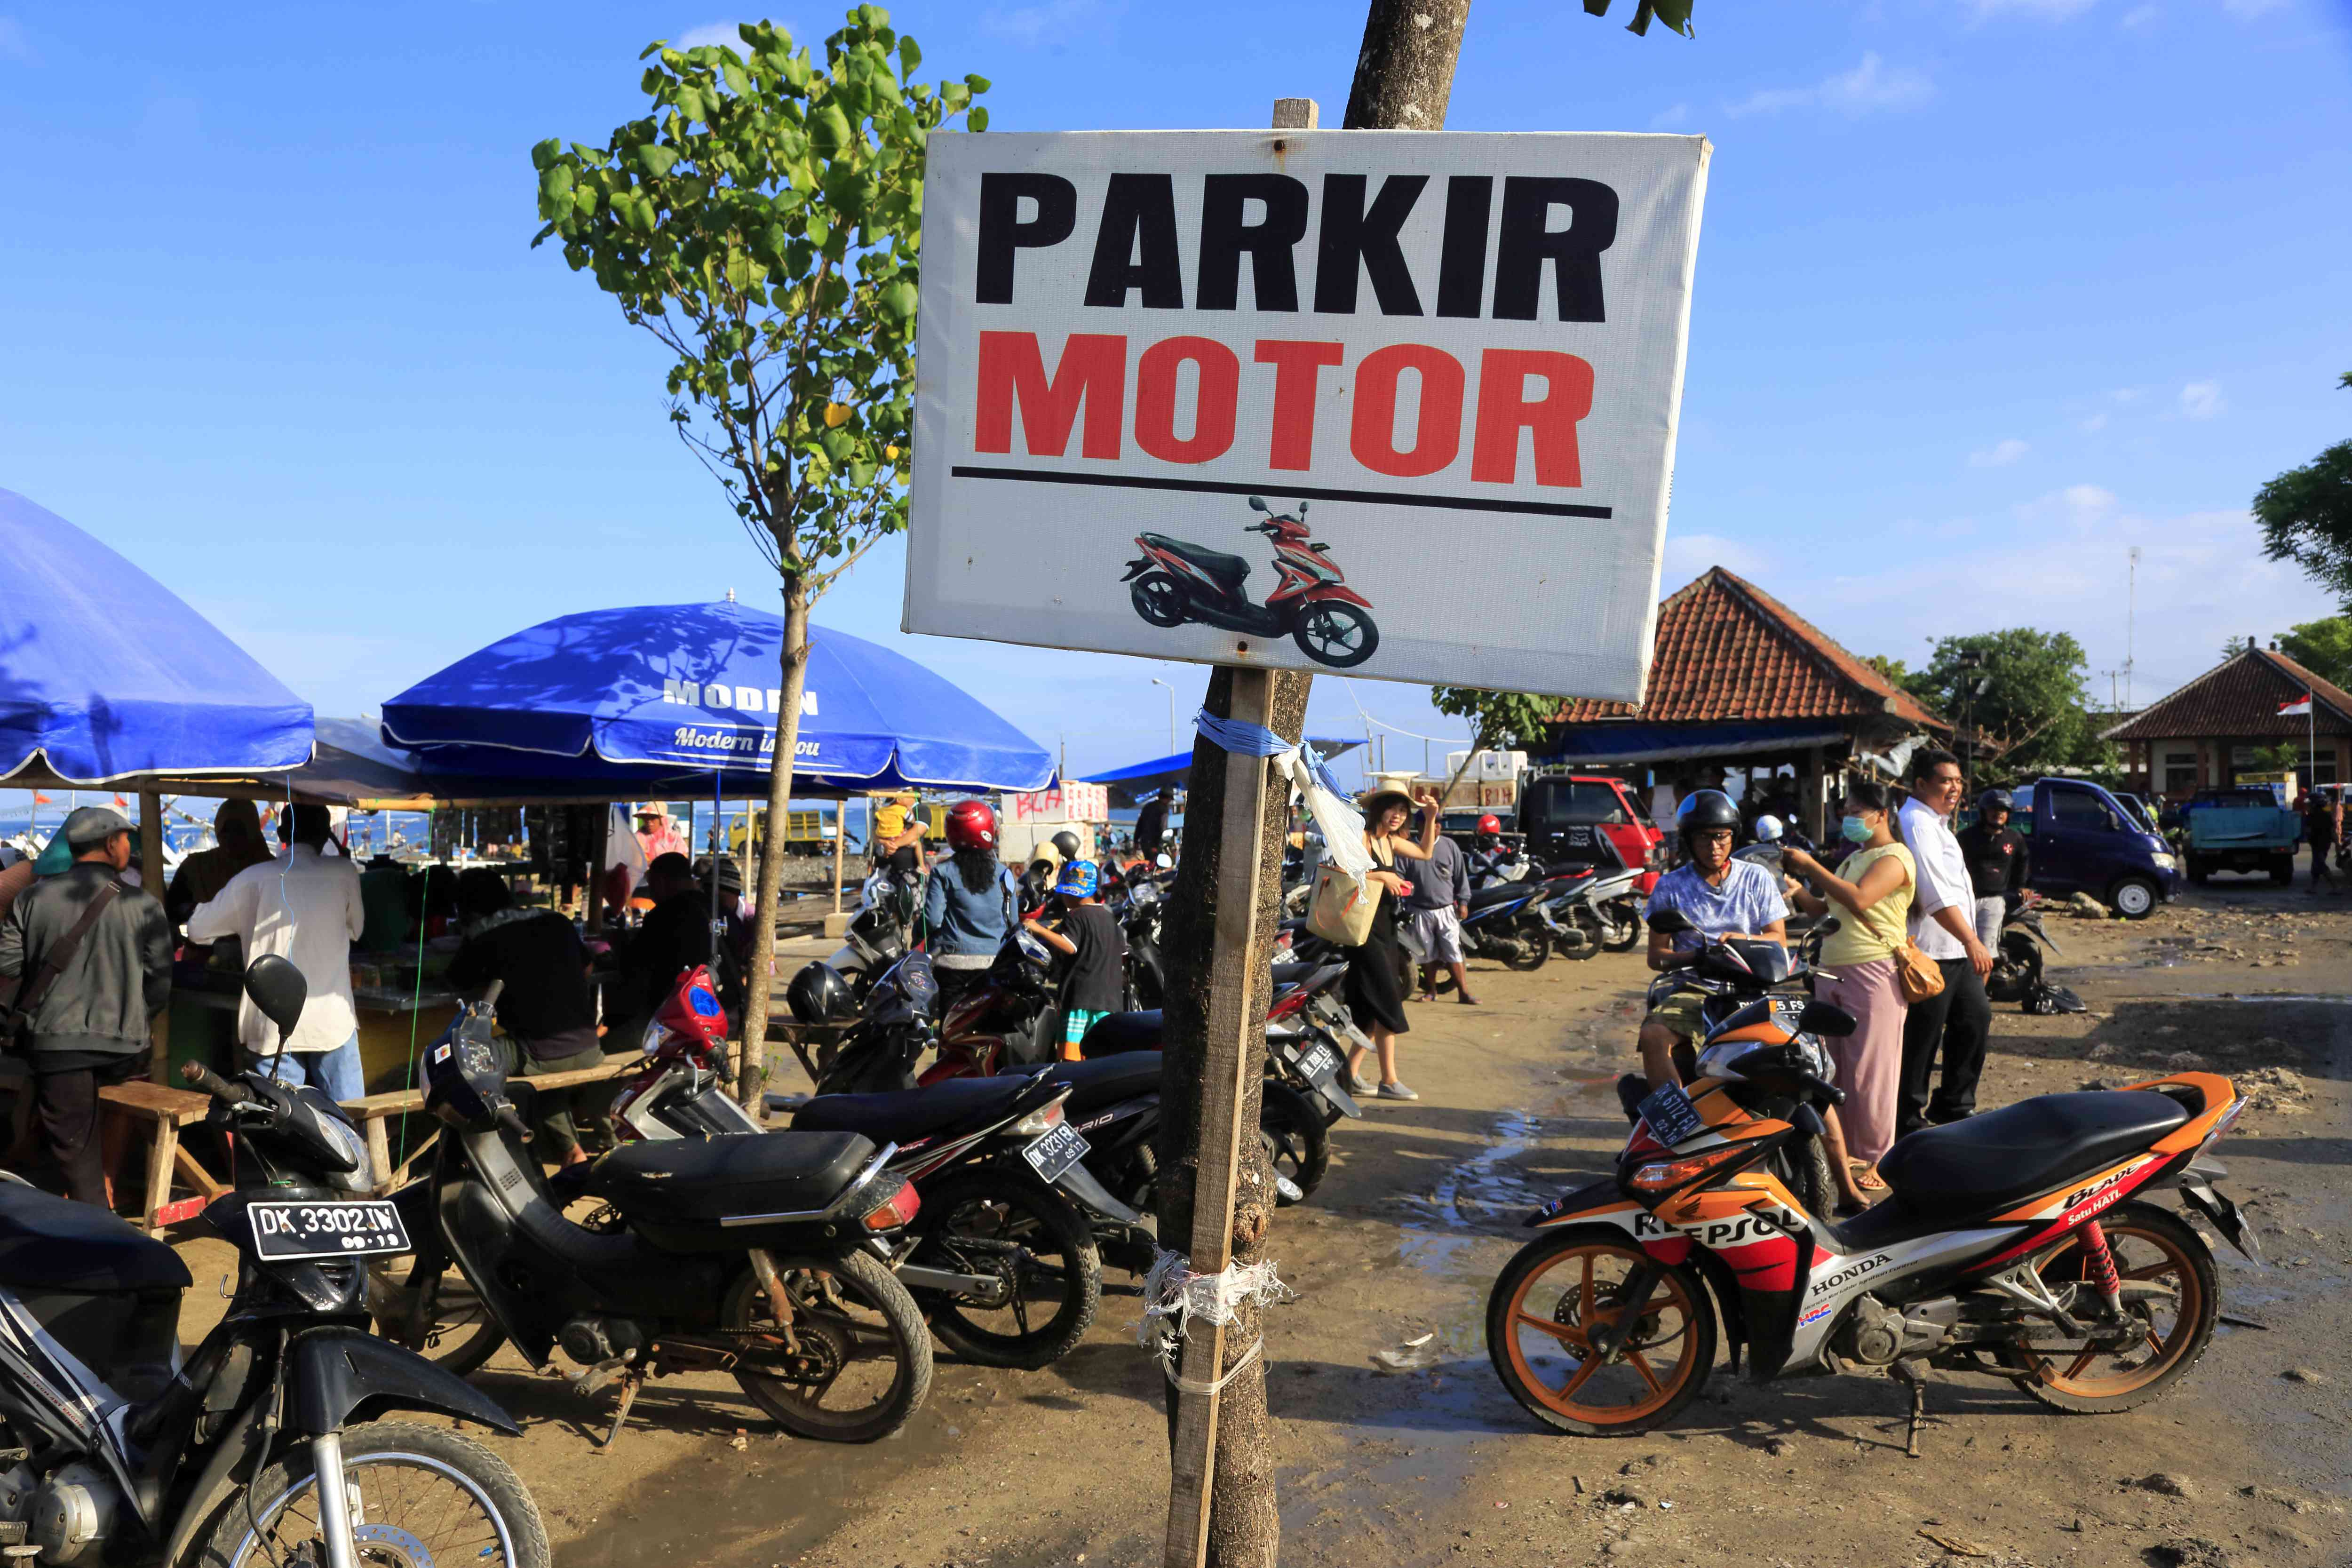 Motorbike parking at a beach in Bali